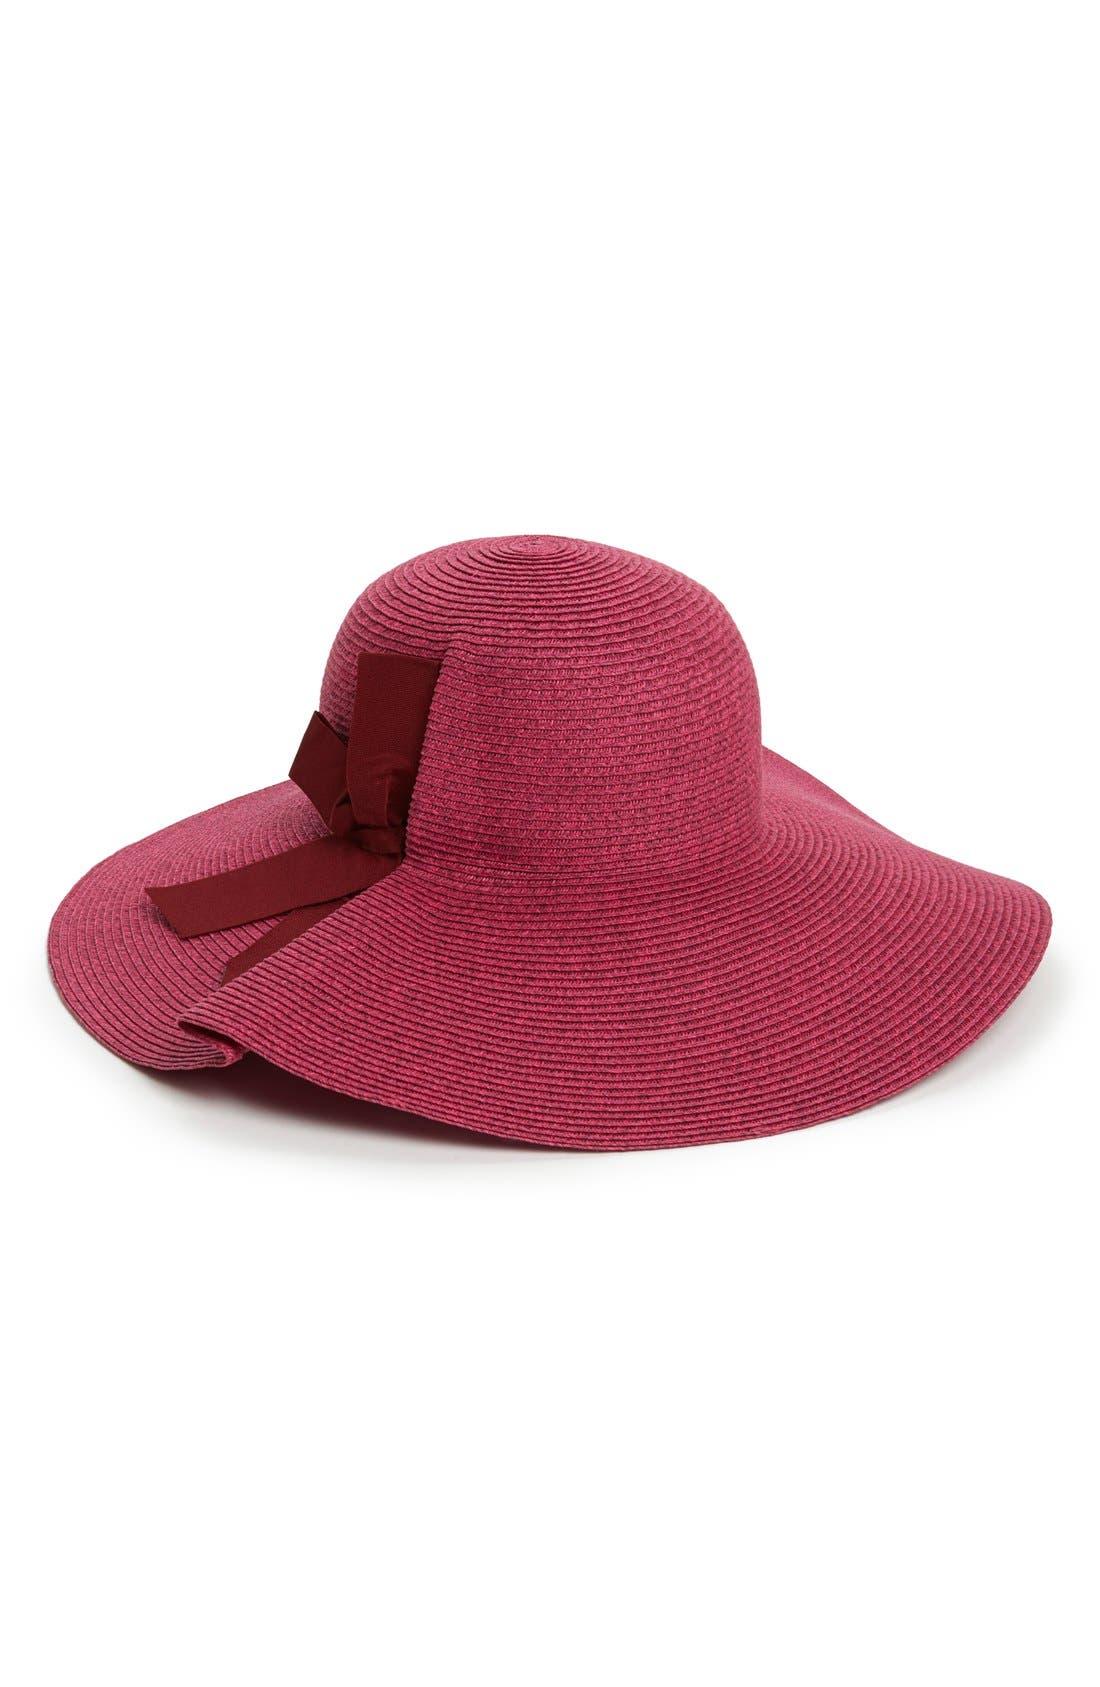 Main Image - Jessica Simpson Side Bow Floppy Hat